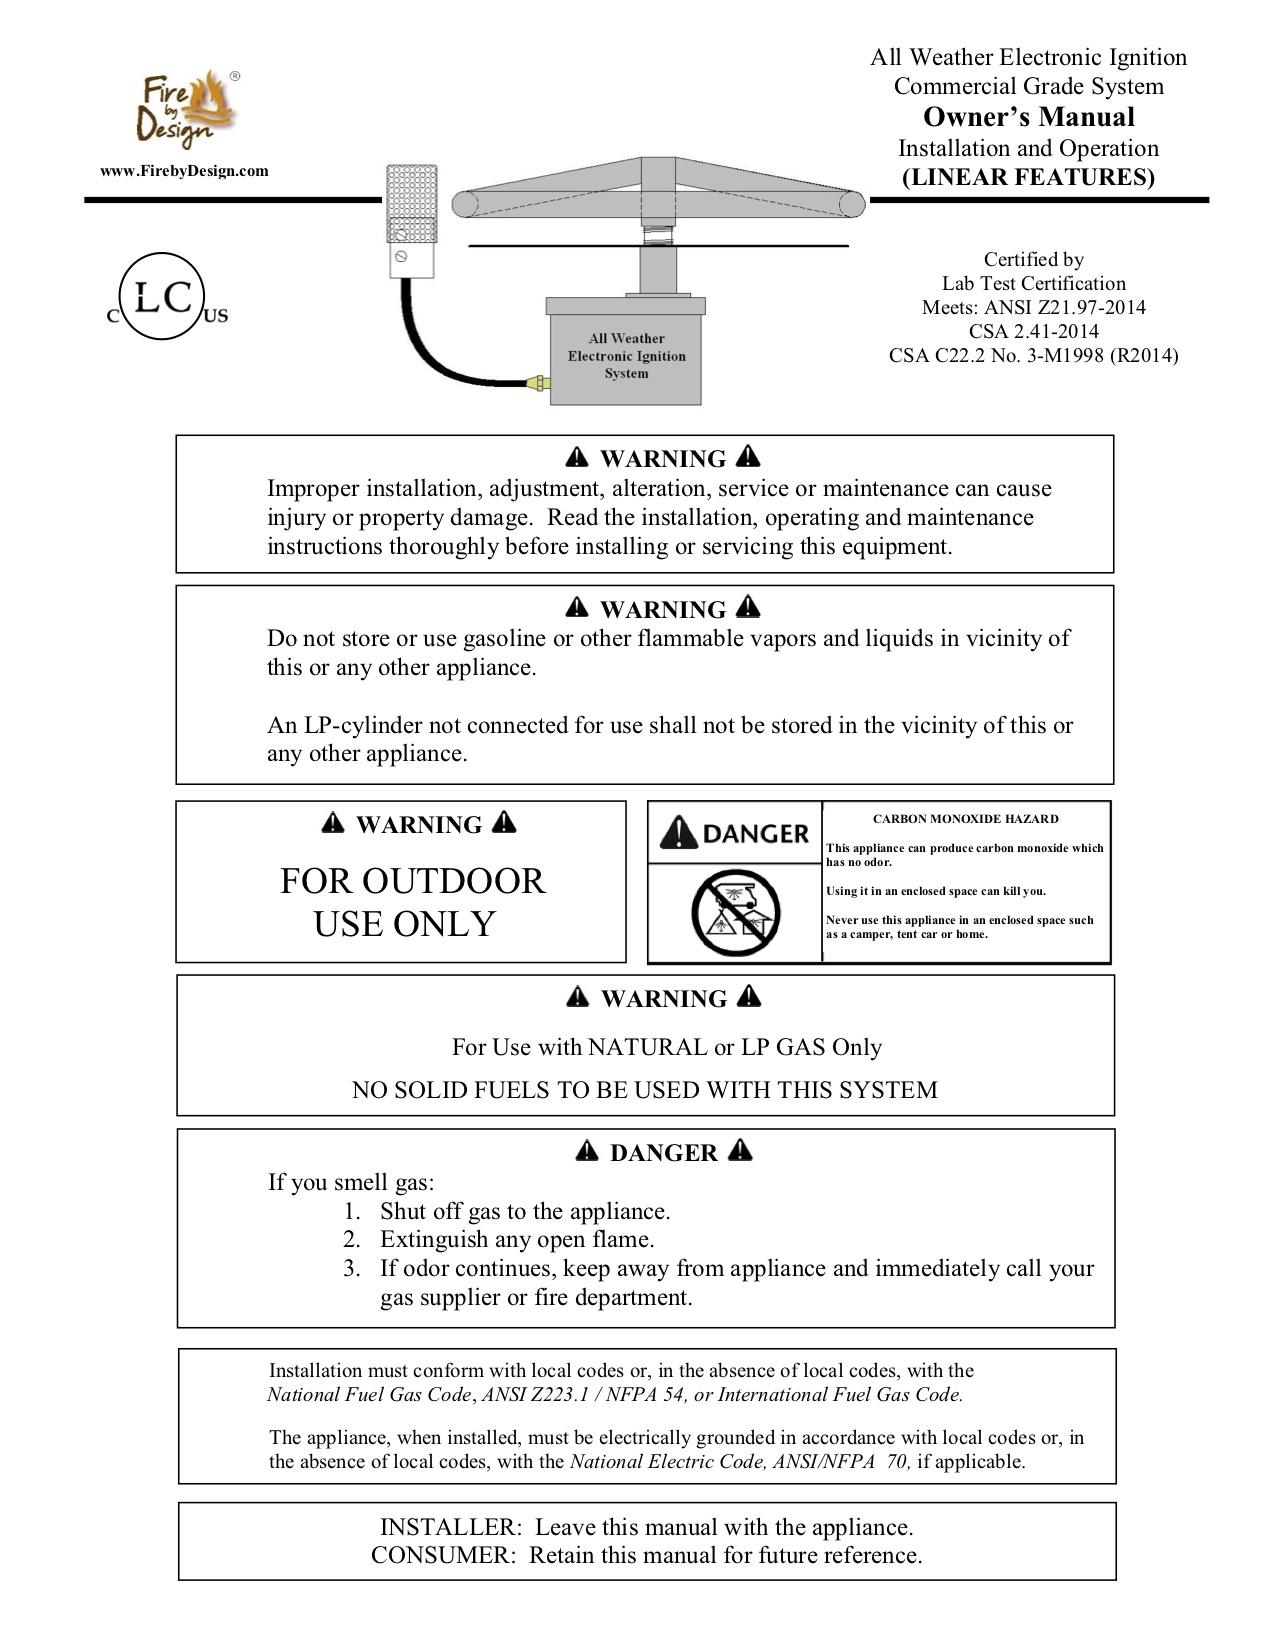 aweis-cg-install-instructions-linear-certified.jpg